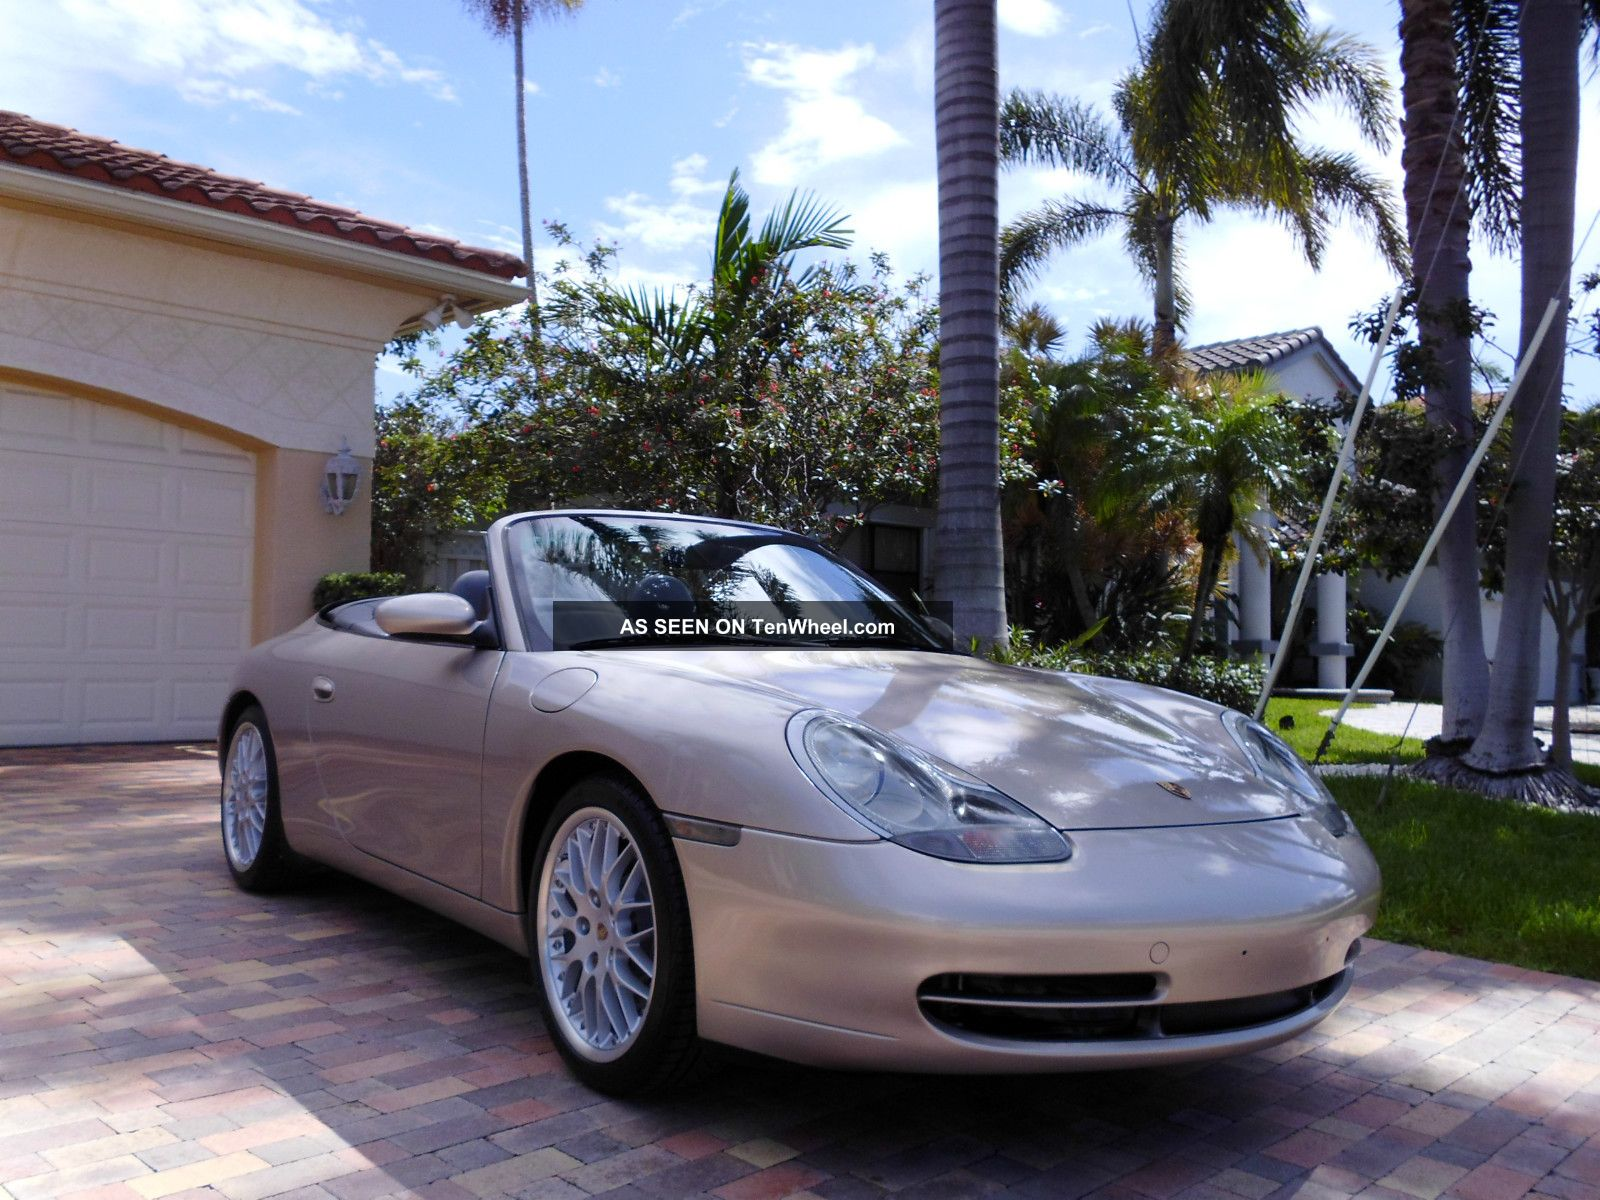 2000 Porsche Carrera 911 996 Cabriolet Convertible 64,  000 Mile Fl Car 911 photo